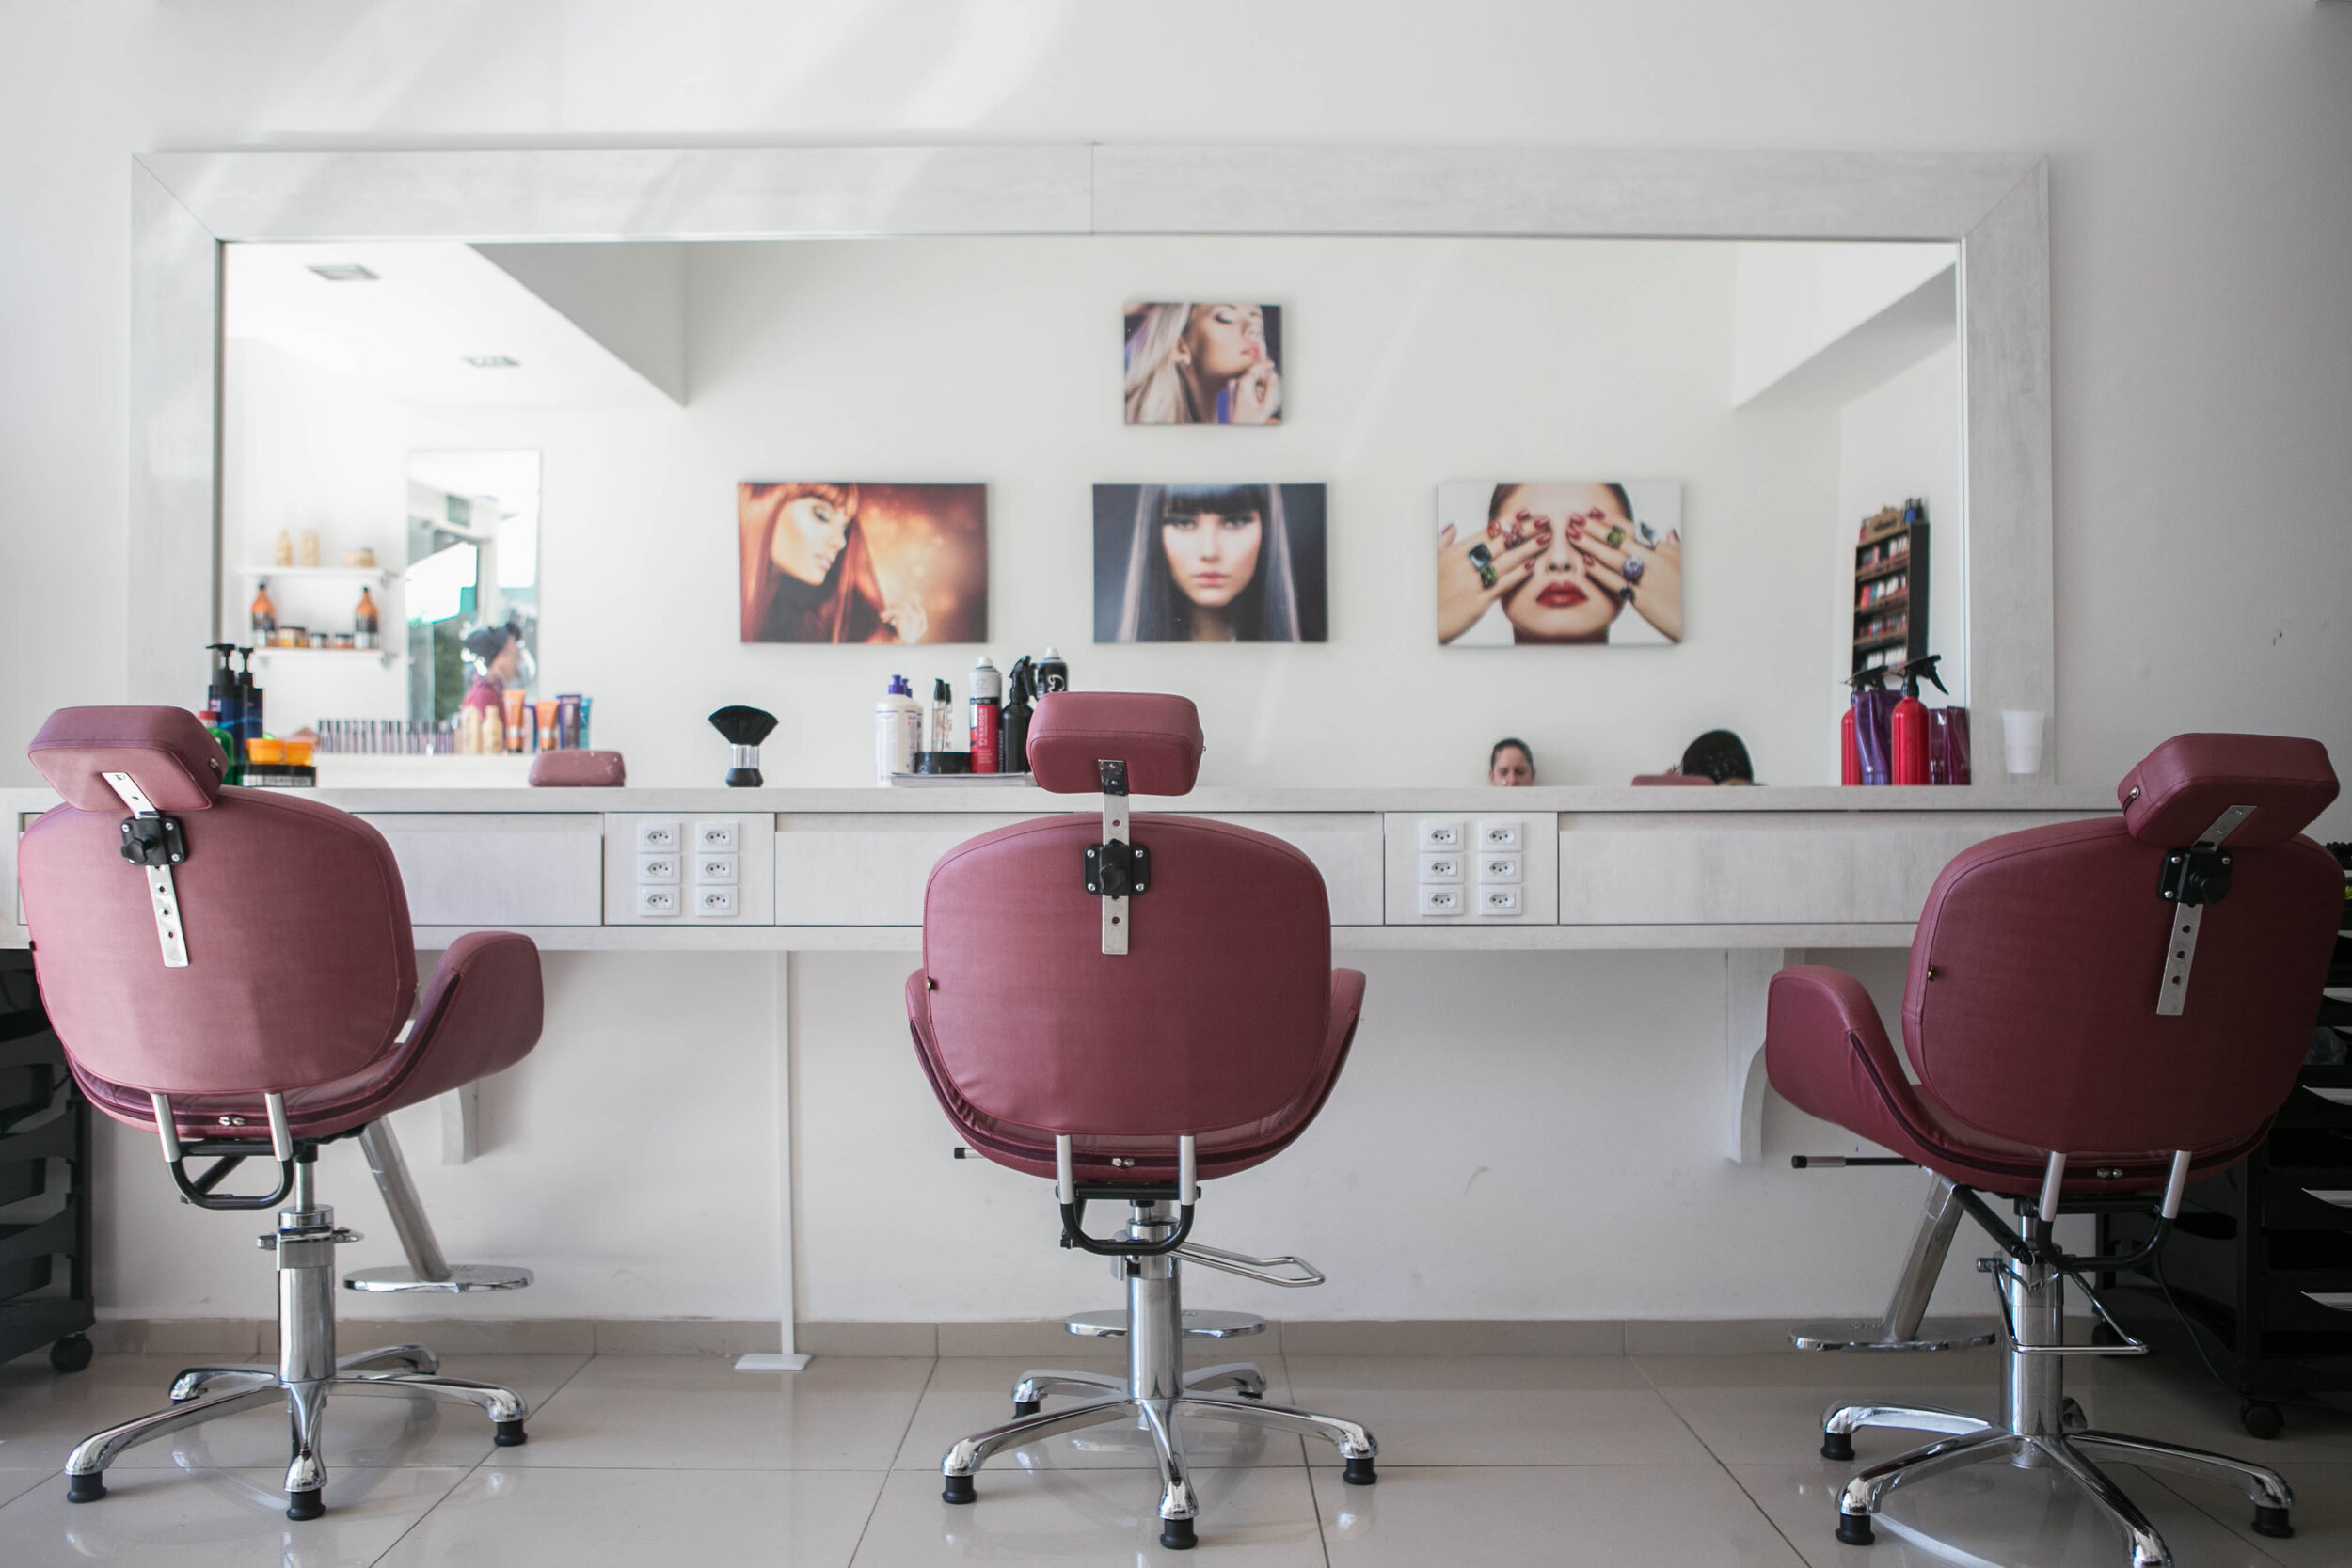 Salon Owner | Kasey Compton